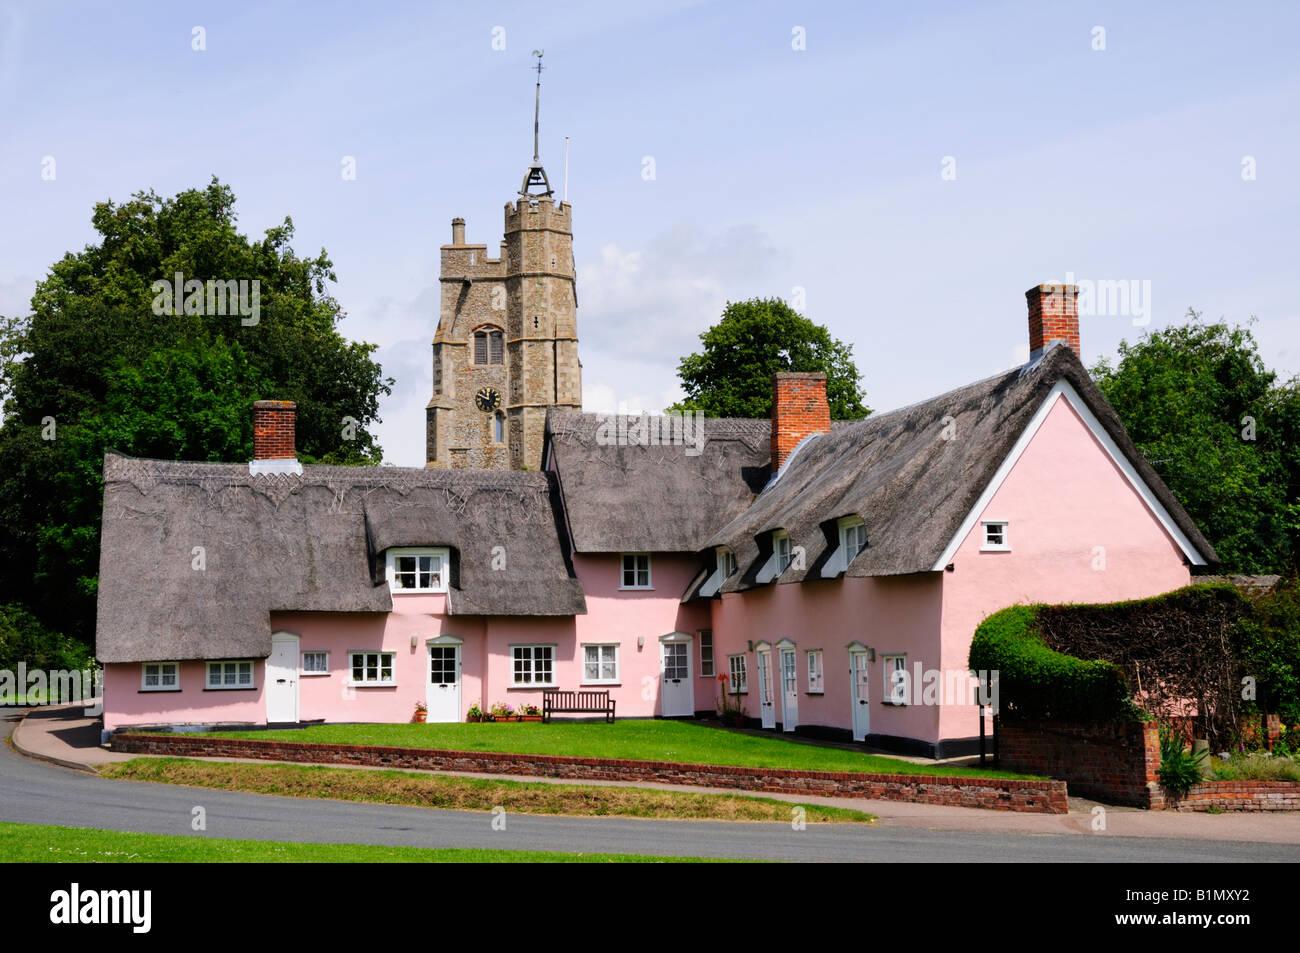 Cottages at Cavendish, Suffolk England UK - Stock Image